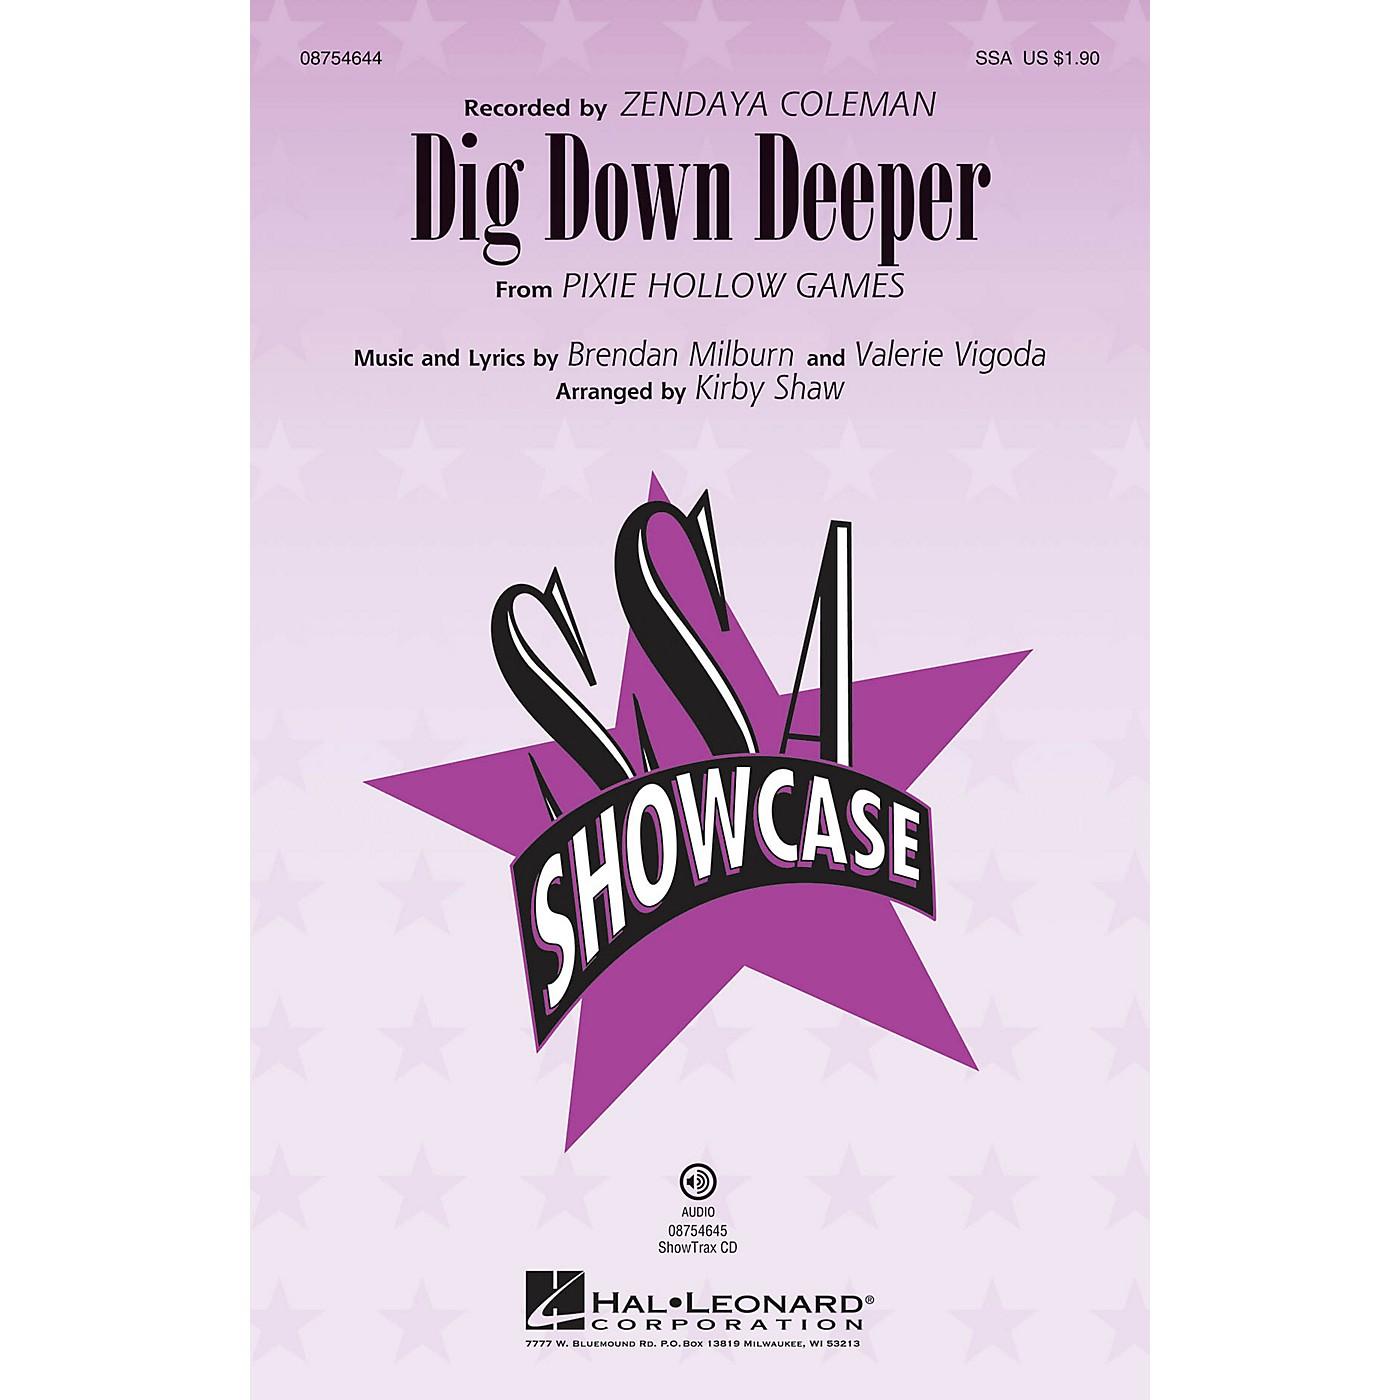 Hal Leonard Dig Down Deeper SSA by Zendaya Coleman arranged by Kirby Shaw thumbnail